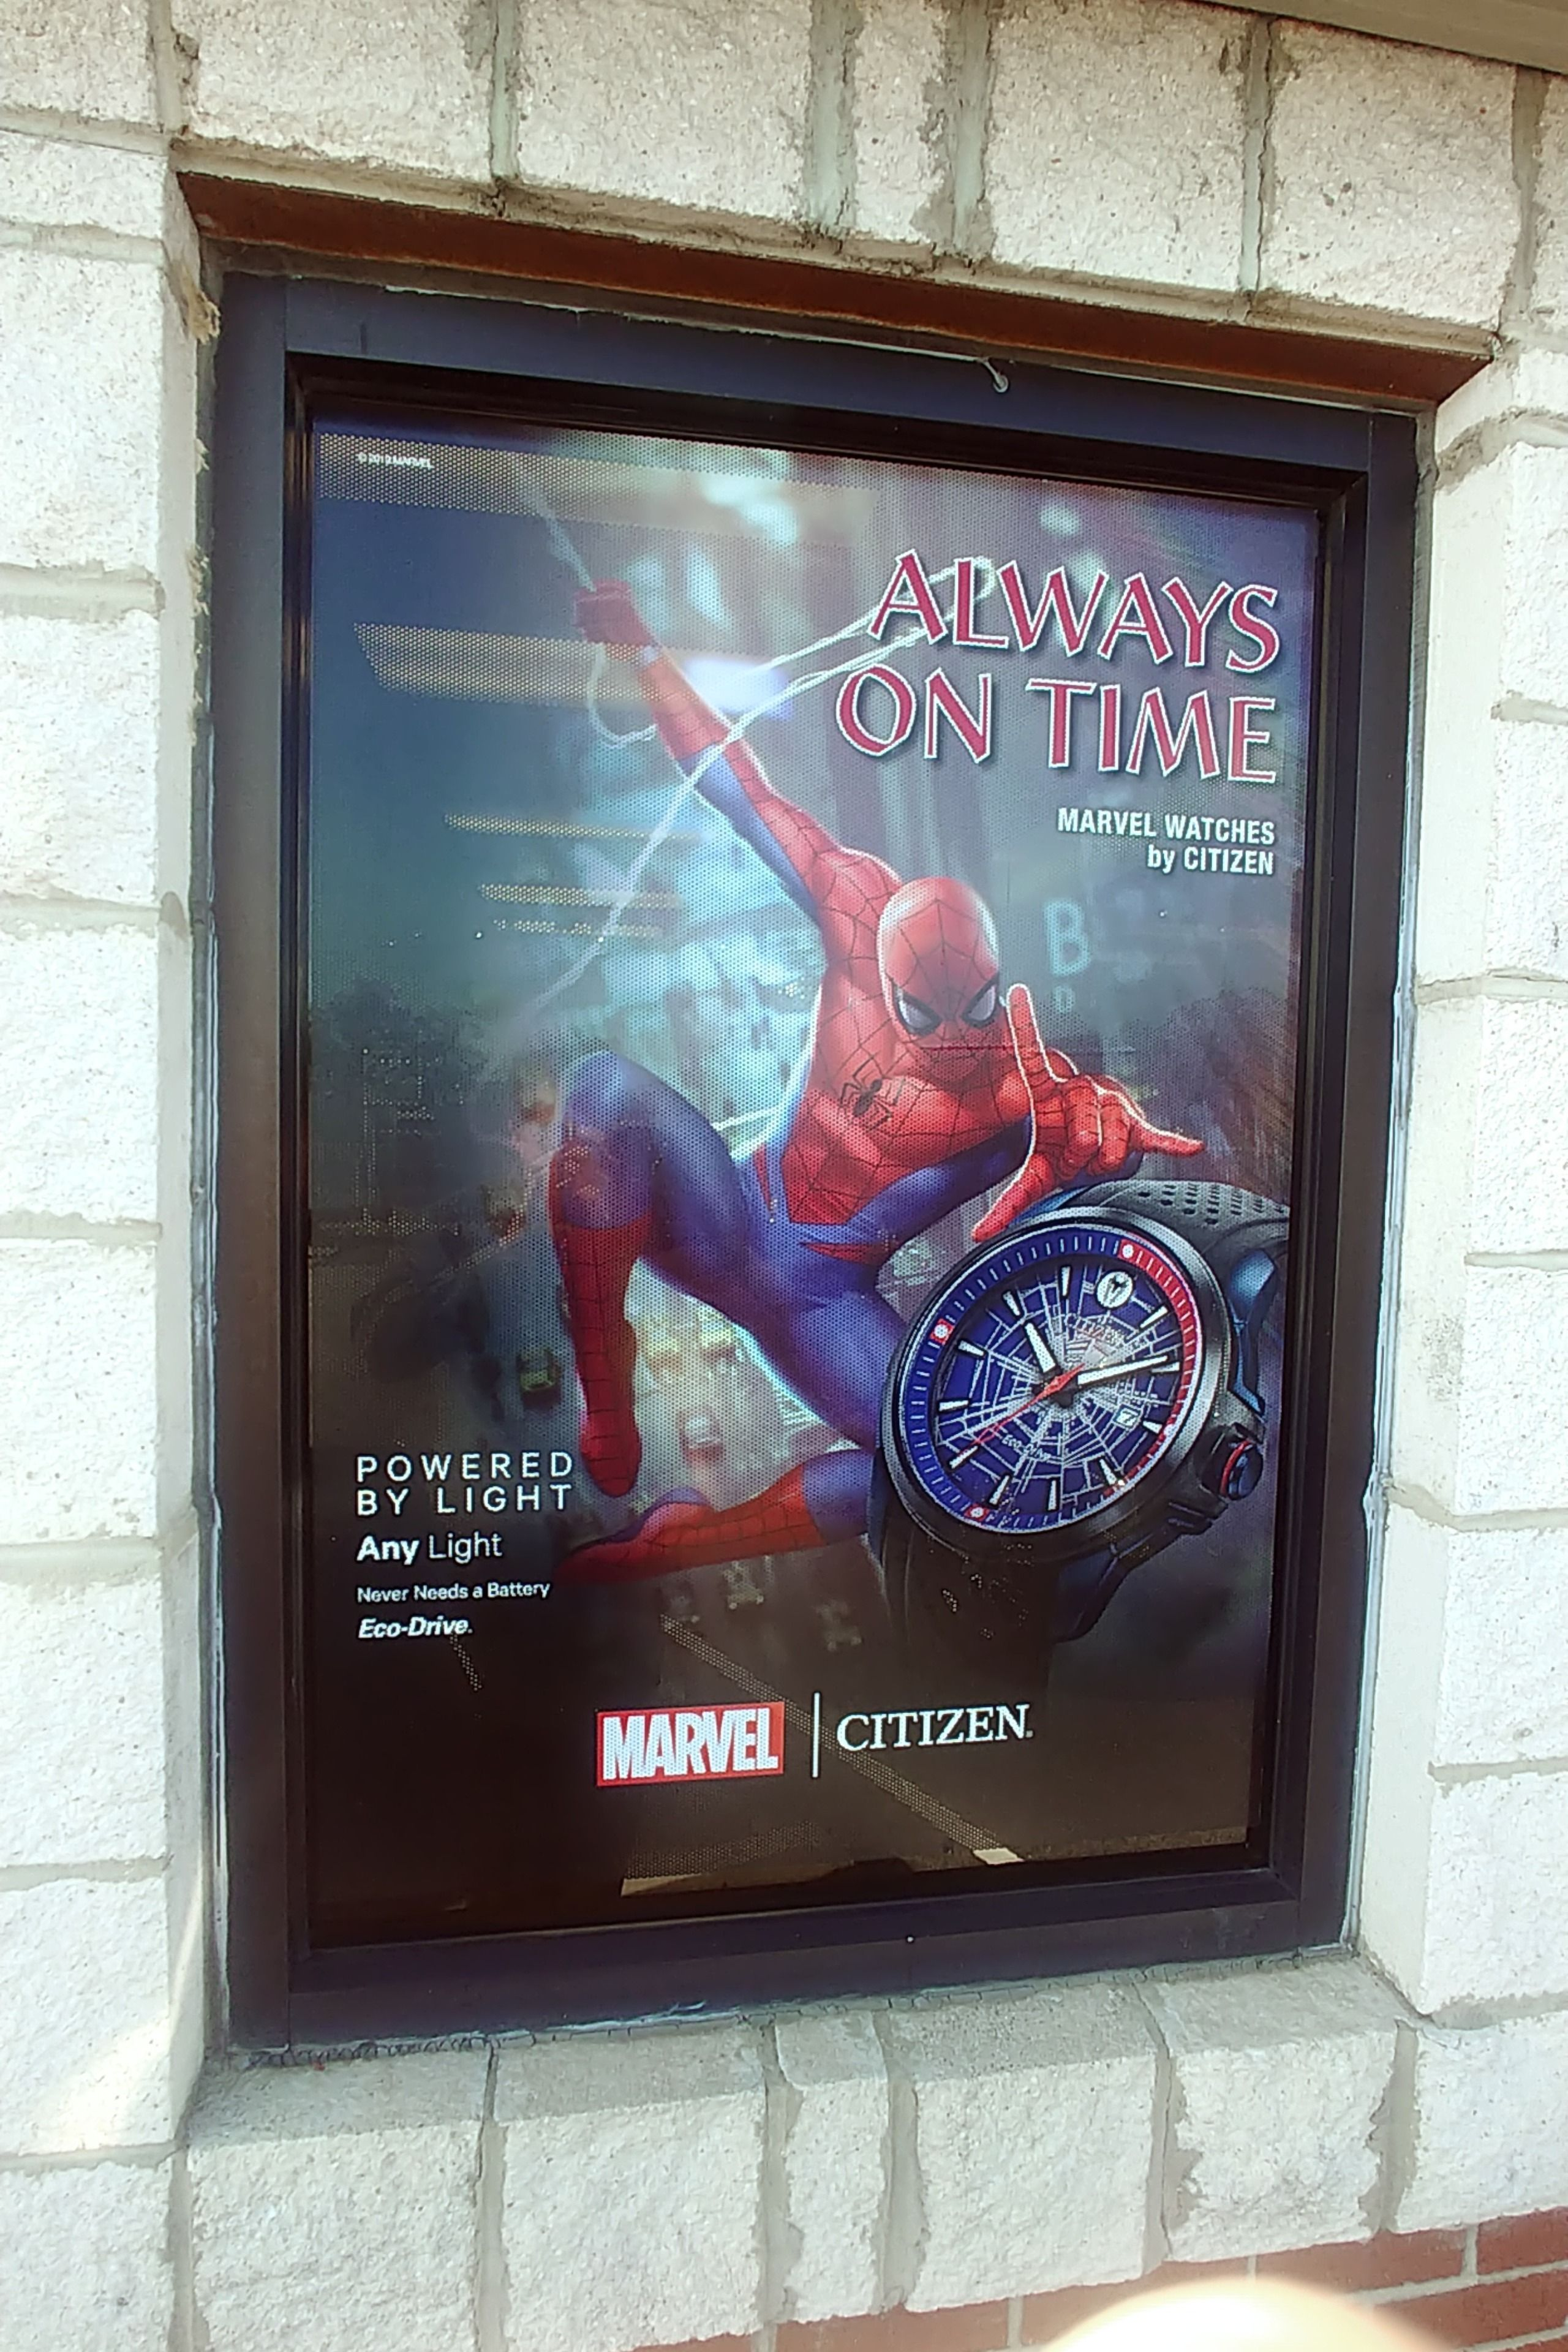 Confirmed sighting of Spiderman at Avis Fine Jewewlry in